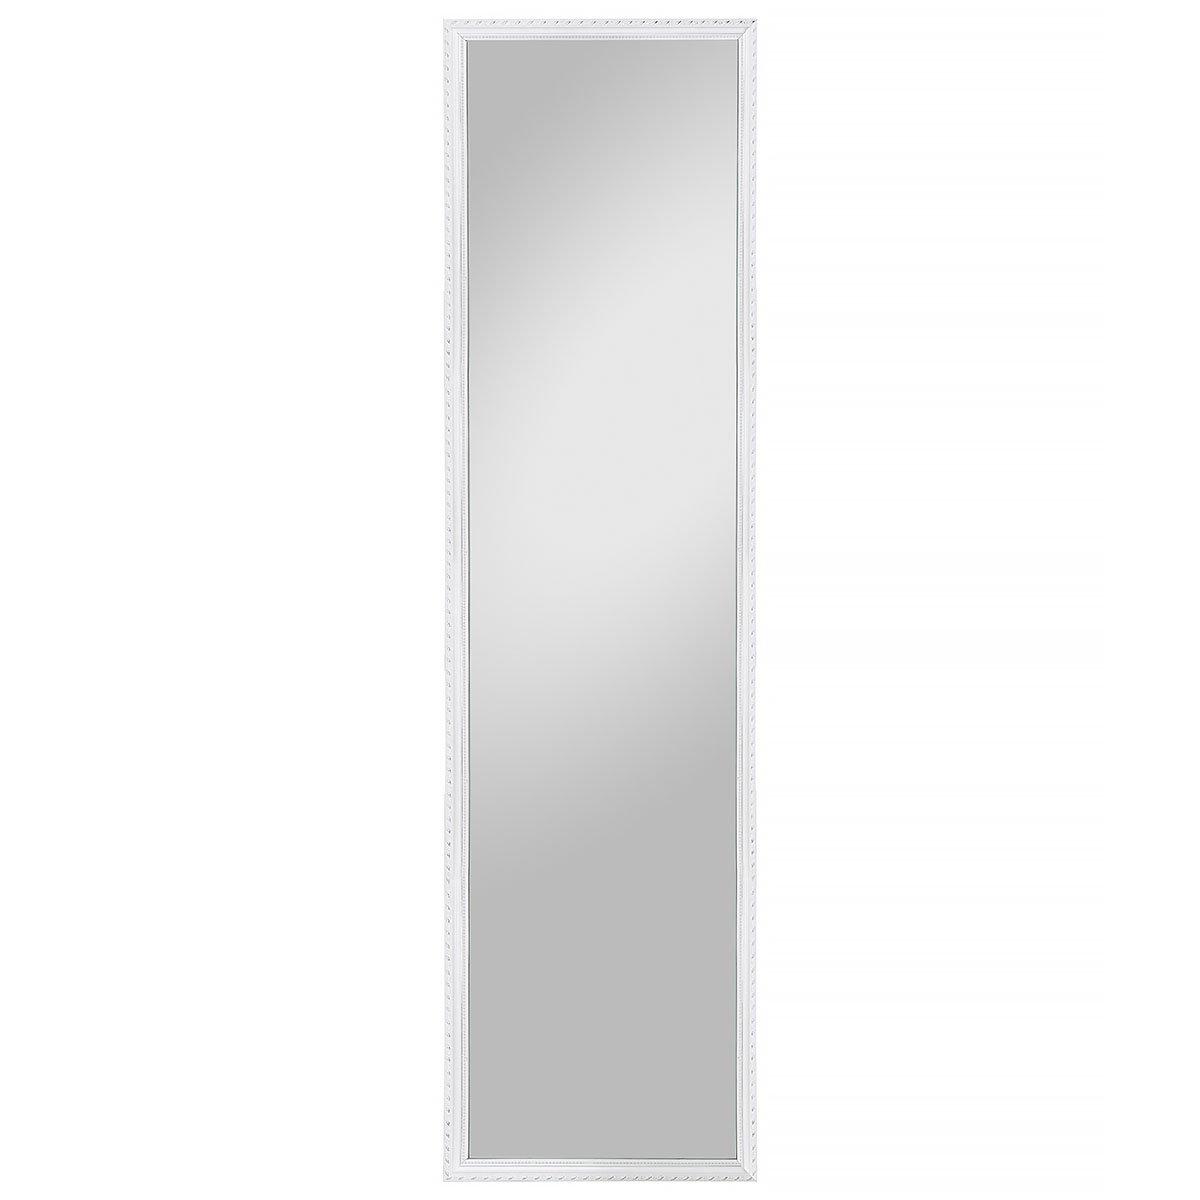 Spiegelprofi Rahmenspiegel, Holz, weiß, 35 x 125 cm